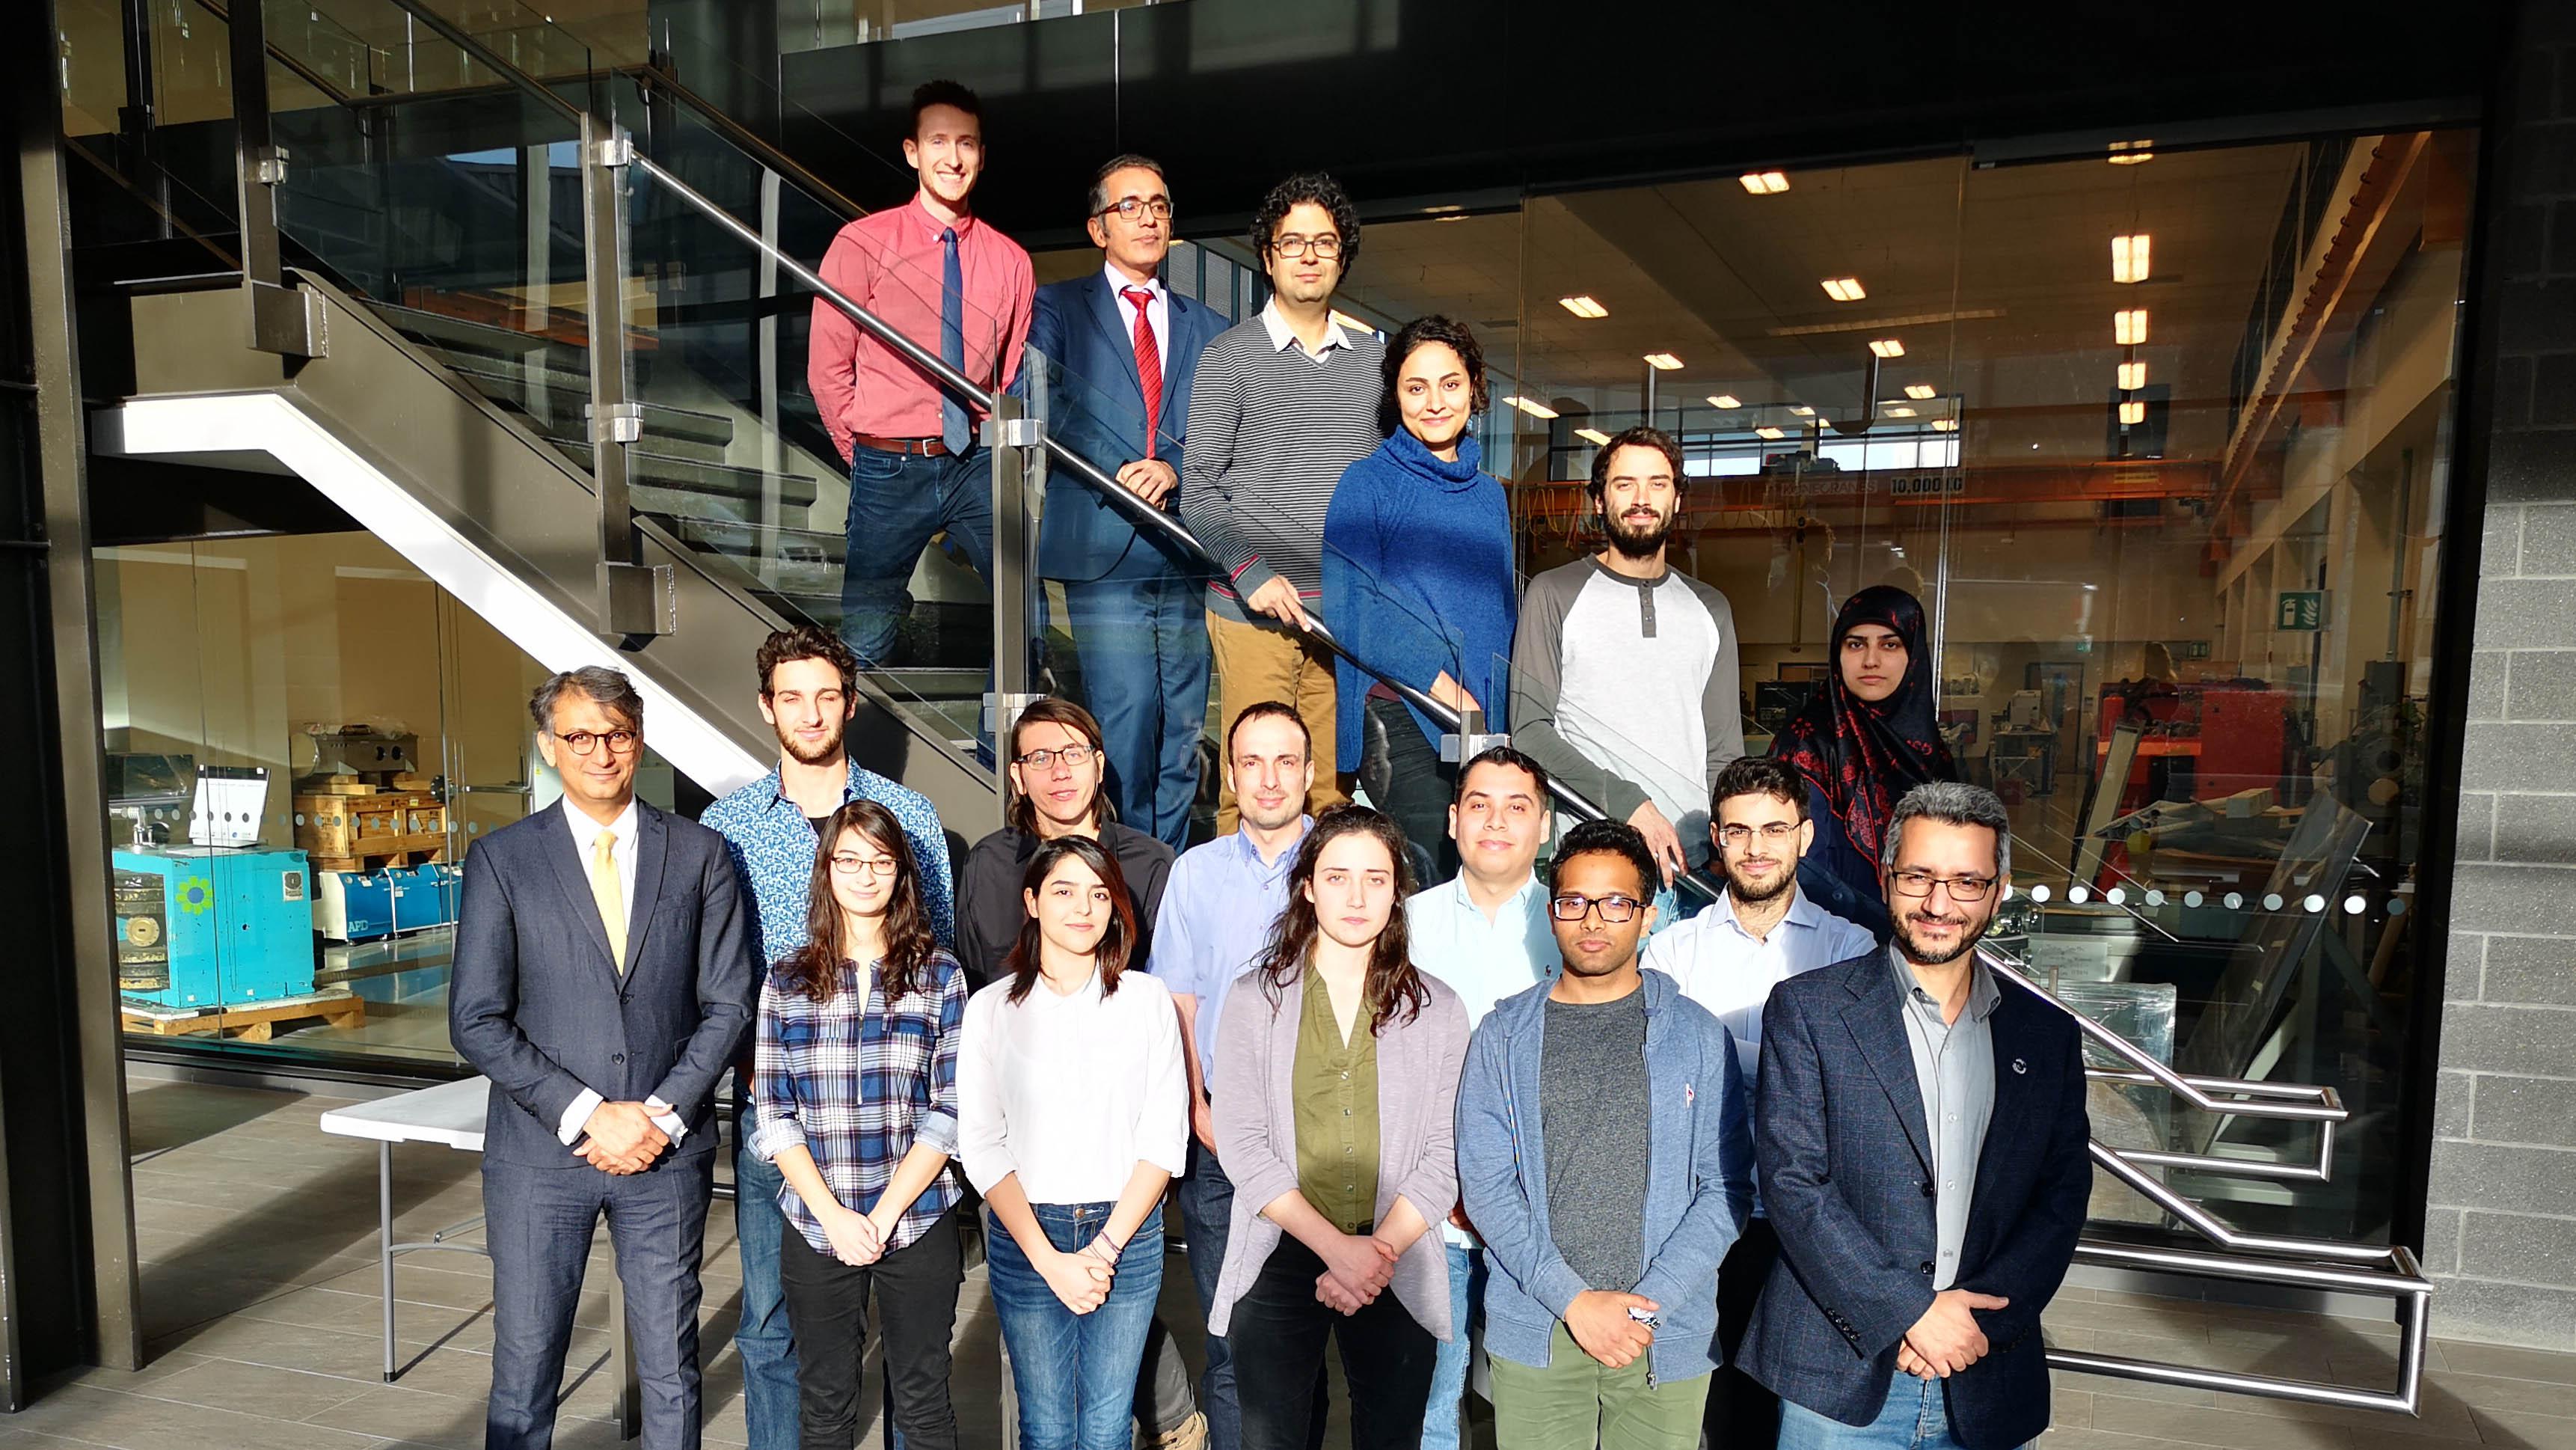 Professor Karimi and his team